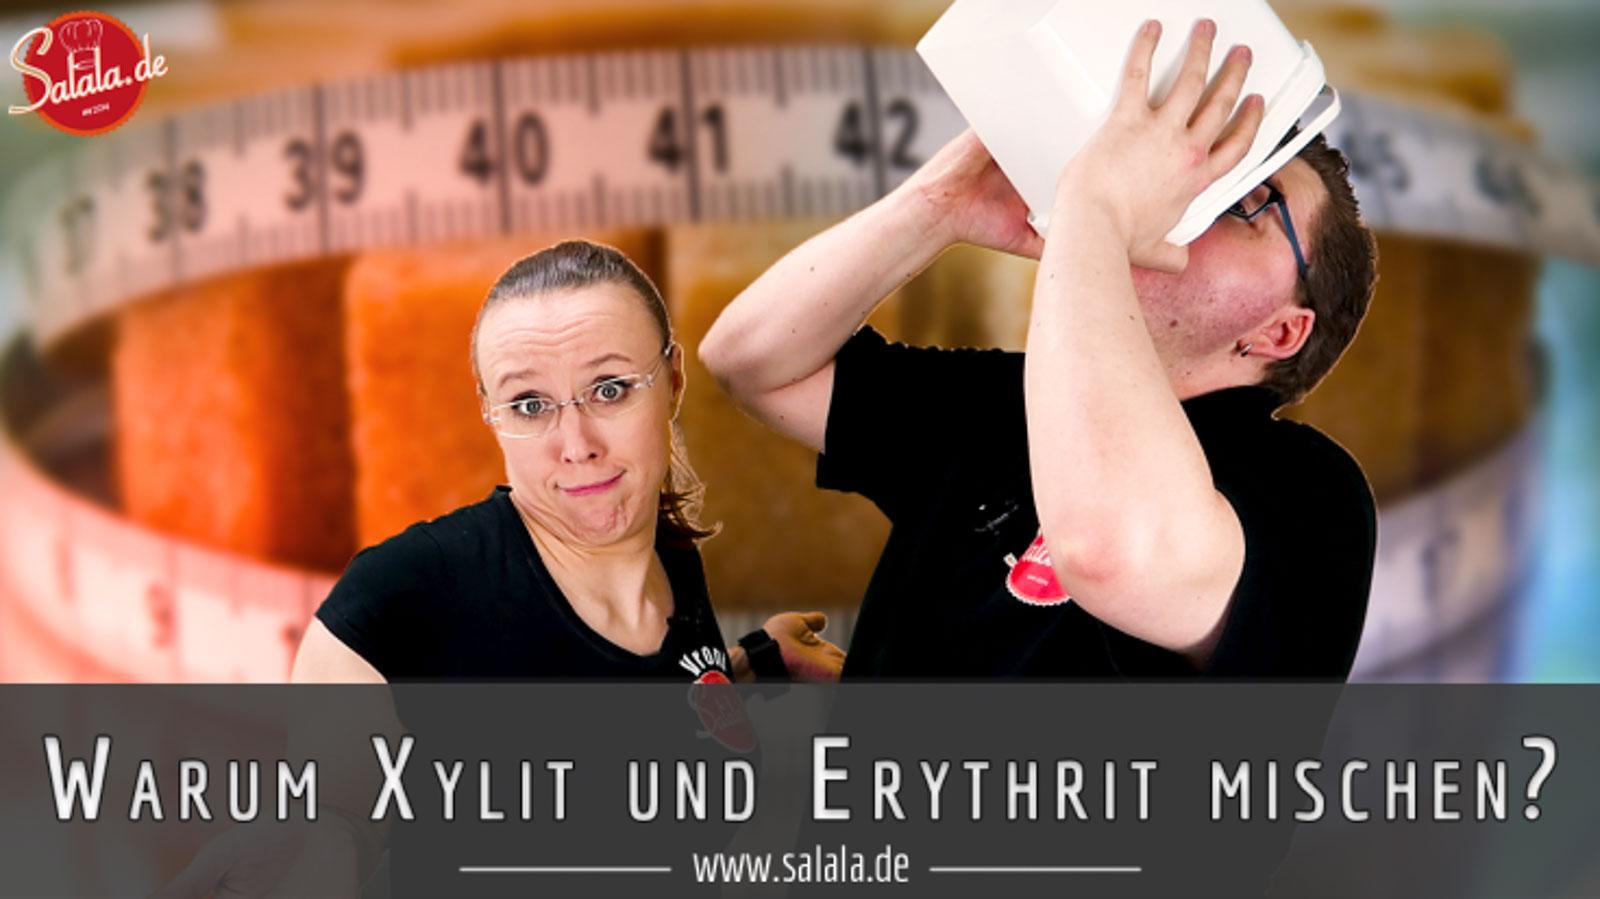 Pudereryxyl – Unsere Xylit-Erythrit-Mischung